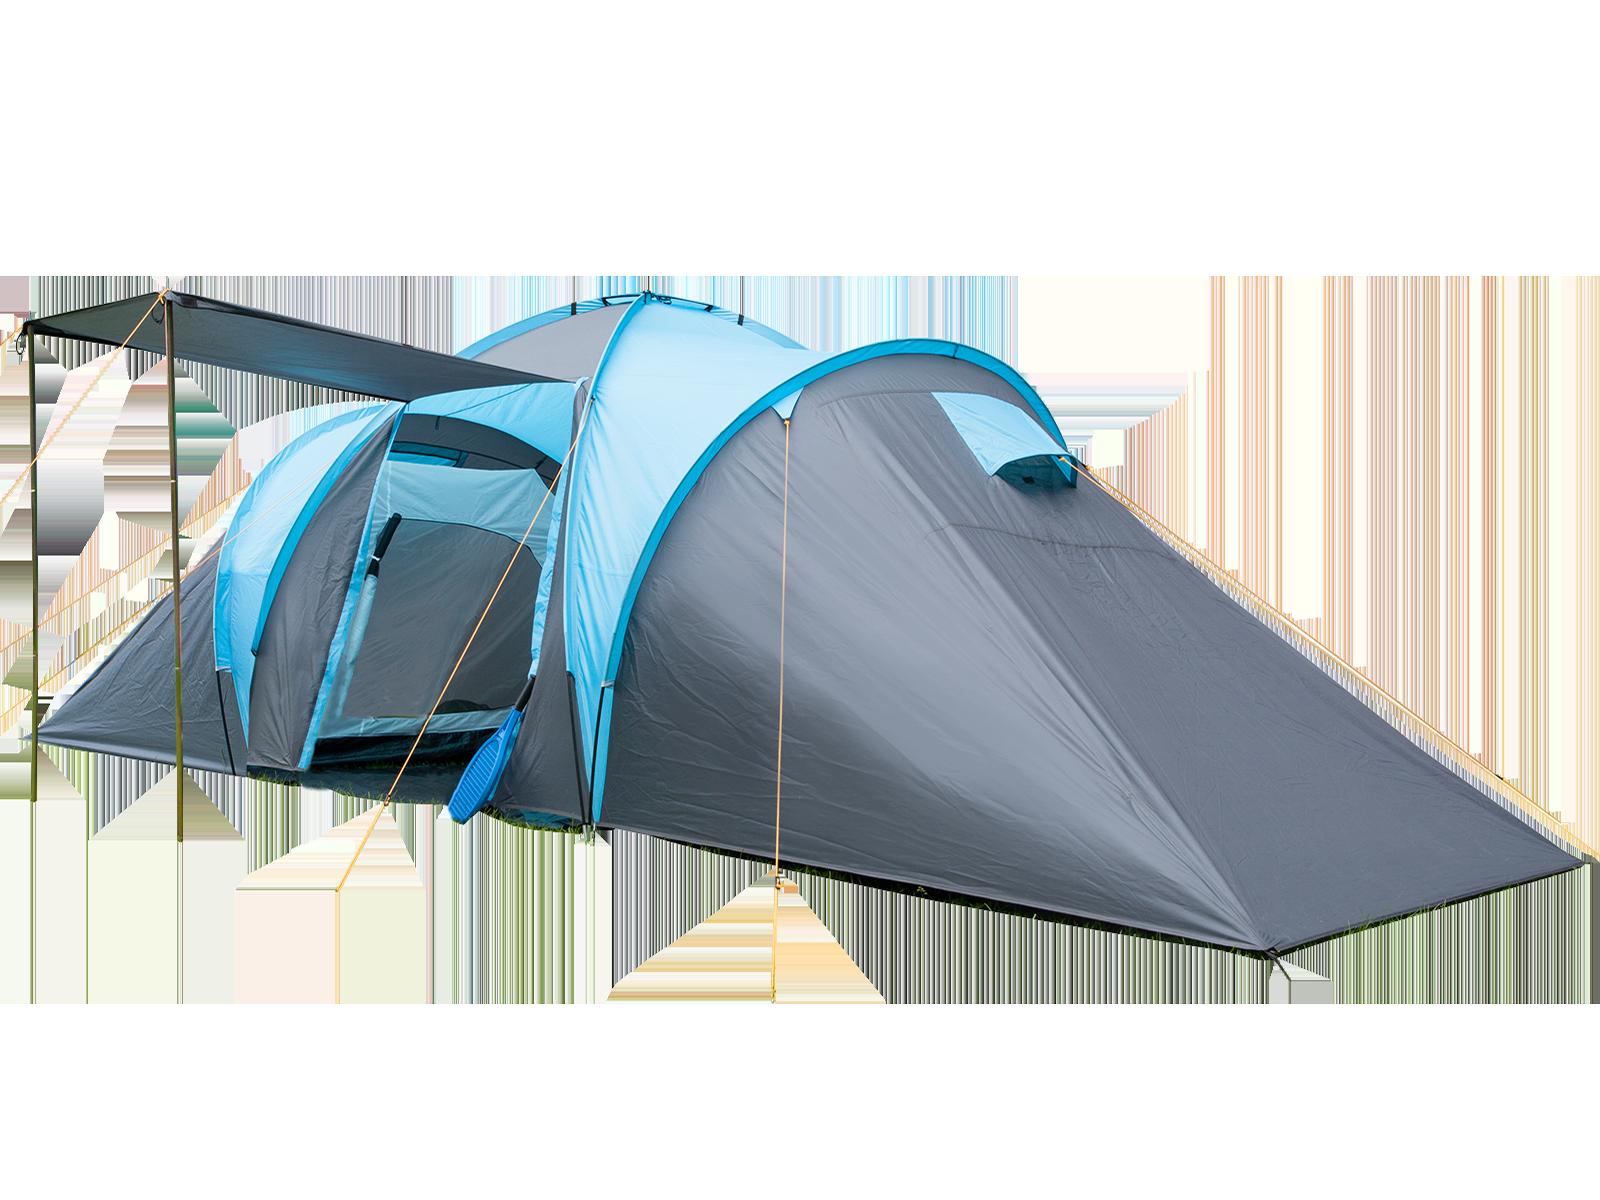 skandika Hammerfest 8 Personen Protect Camping Zelt, mit